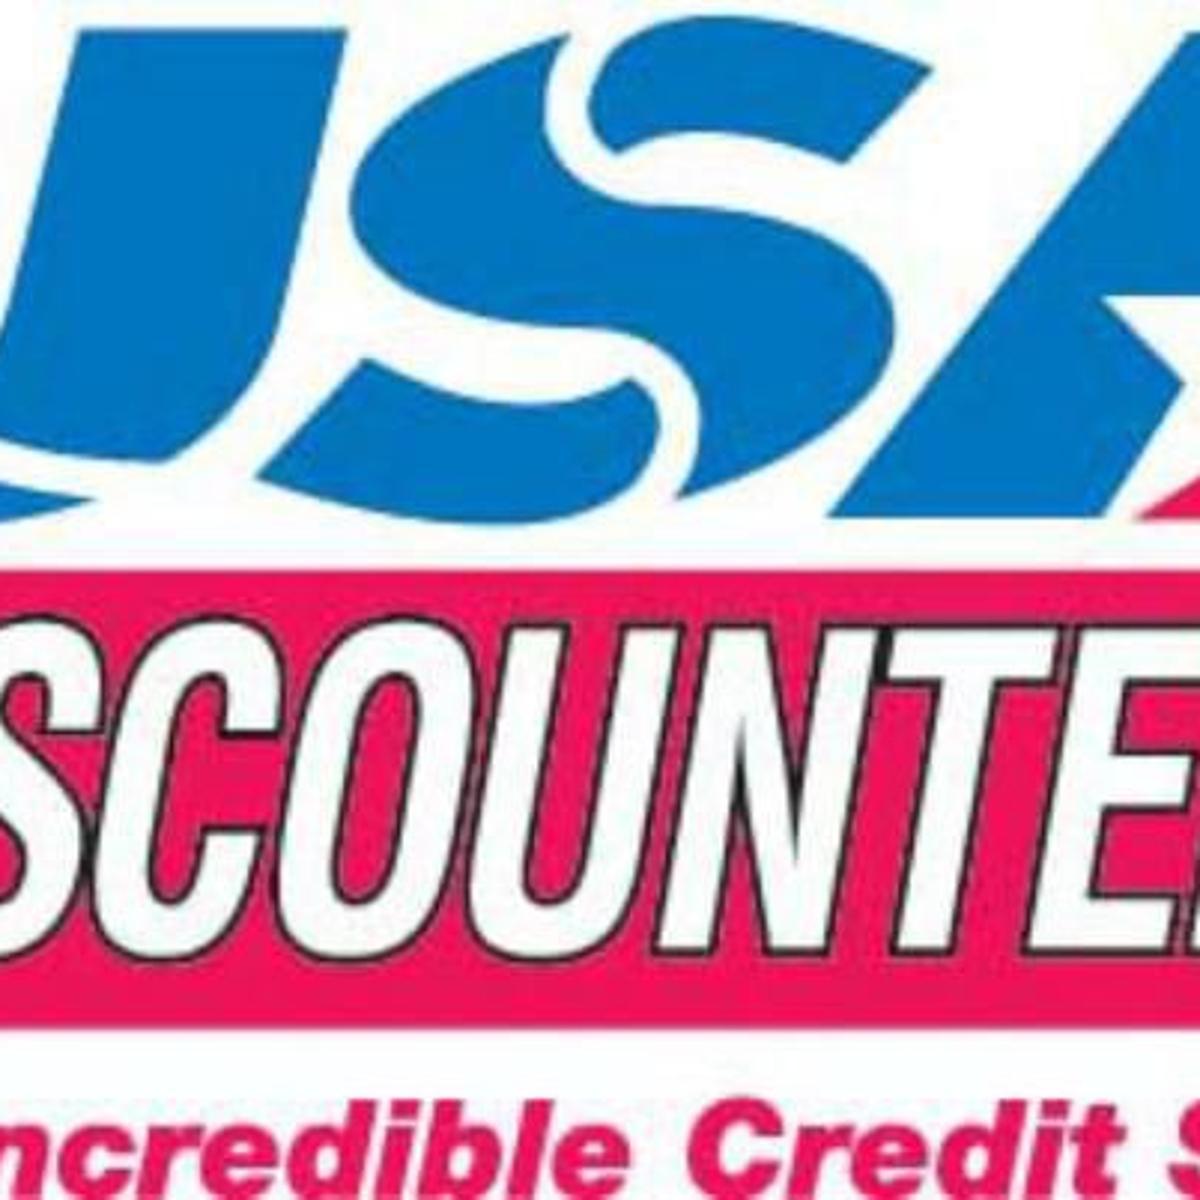 USA Discounters logo